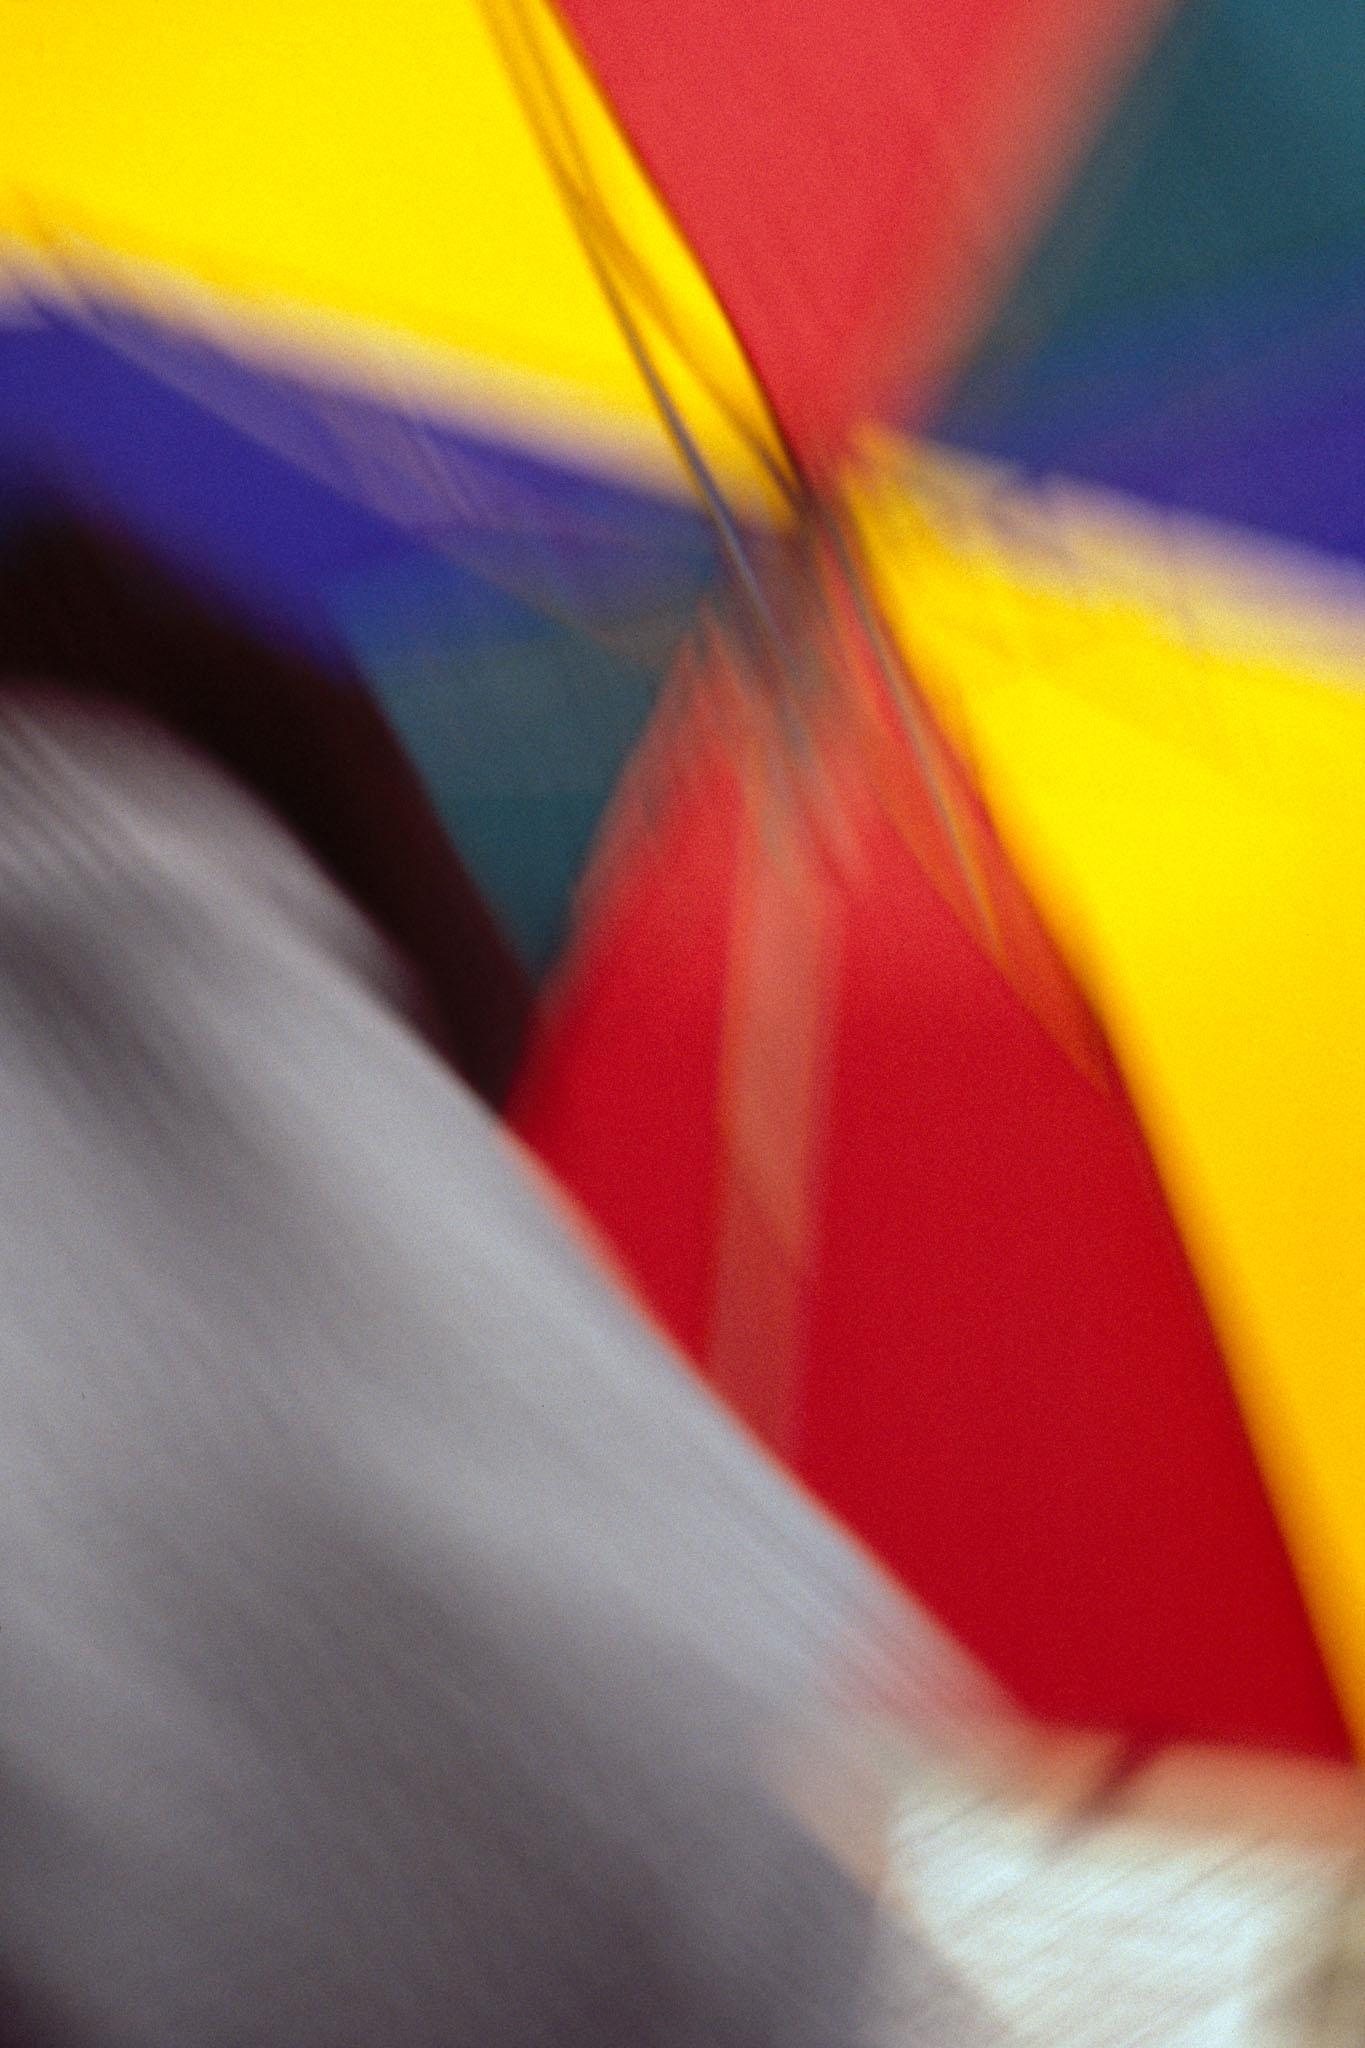 #12_'Colourful umbrella'.jpg